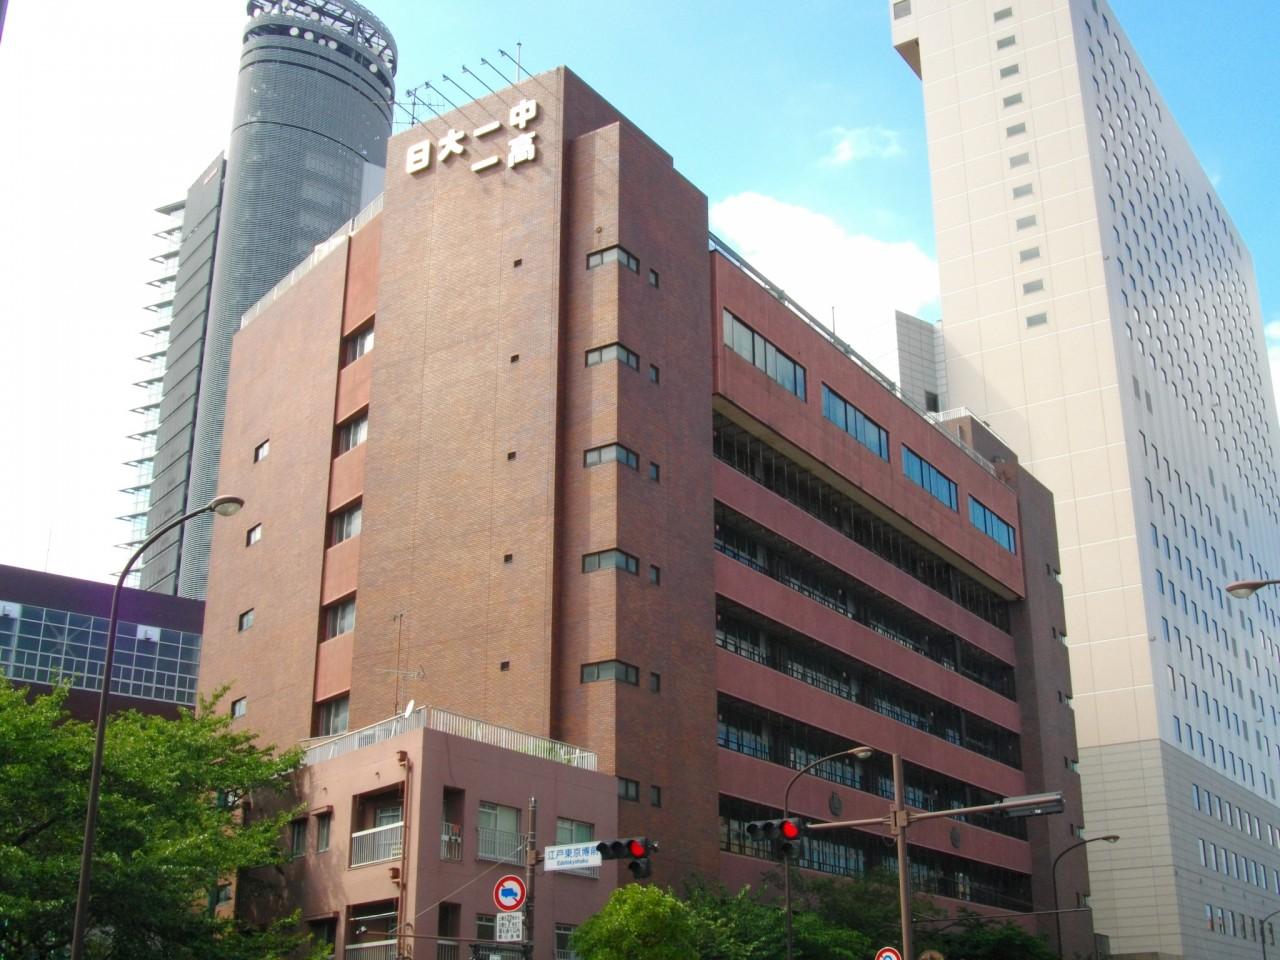 Nihon_University_Daiichi_Junior_&_Senior_High_School